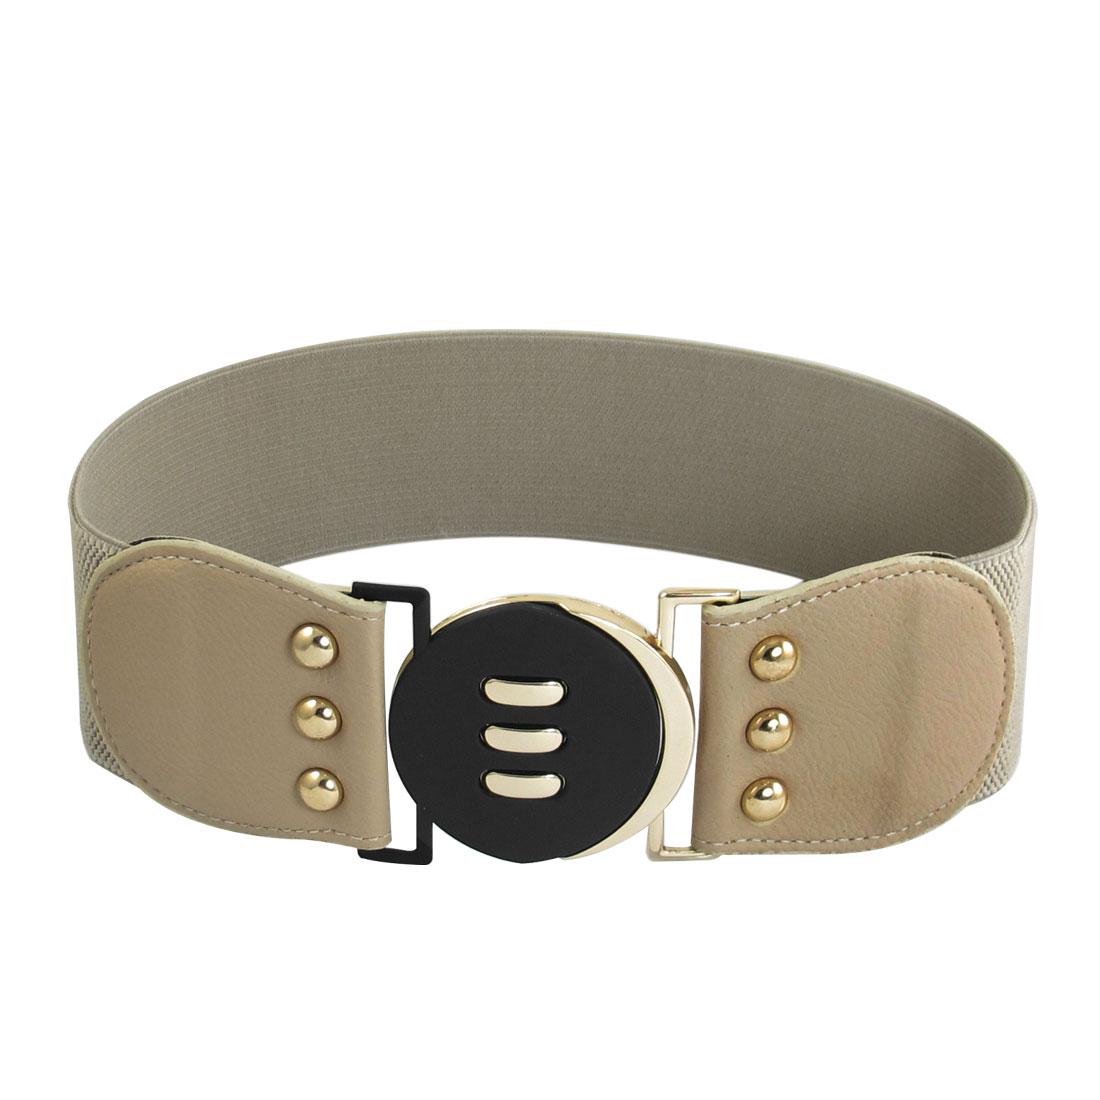 Ladies Light Beige Metal Interlocking Buckle 6cm Width Stretchy Belt